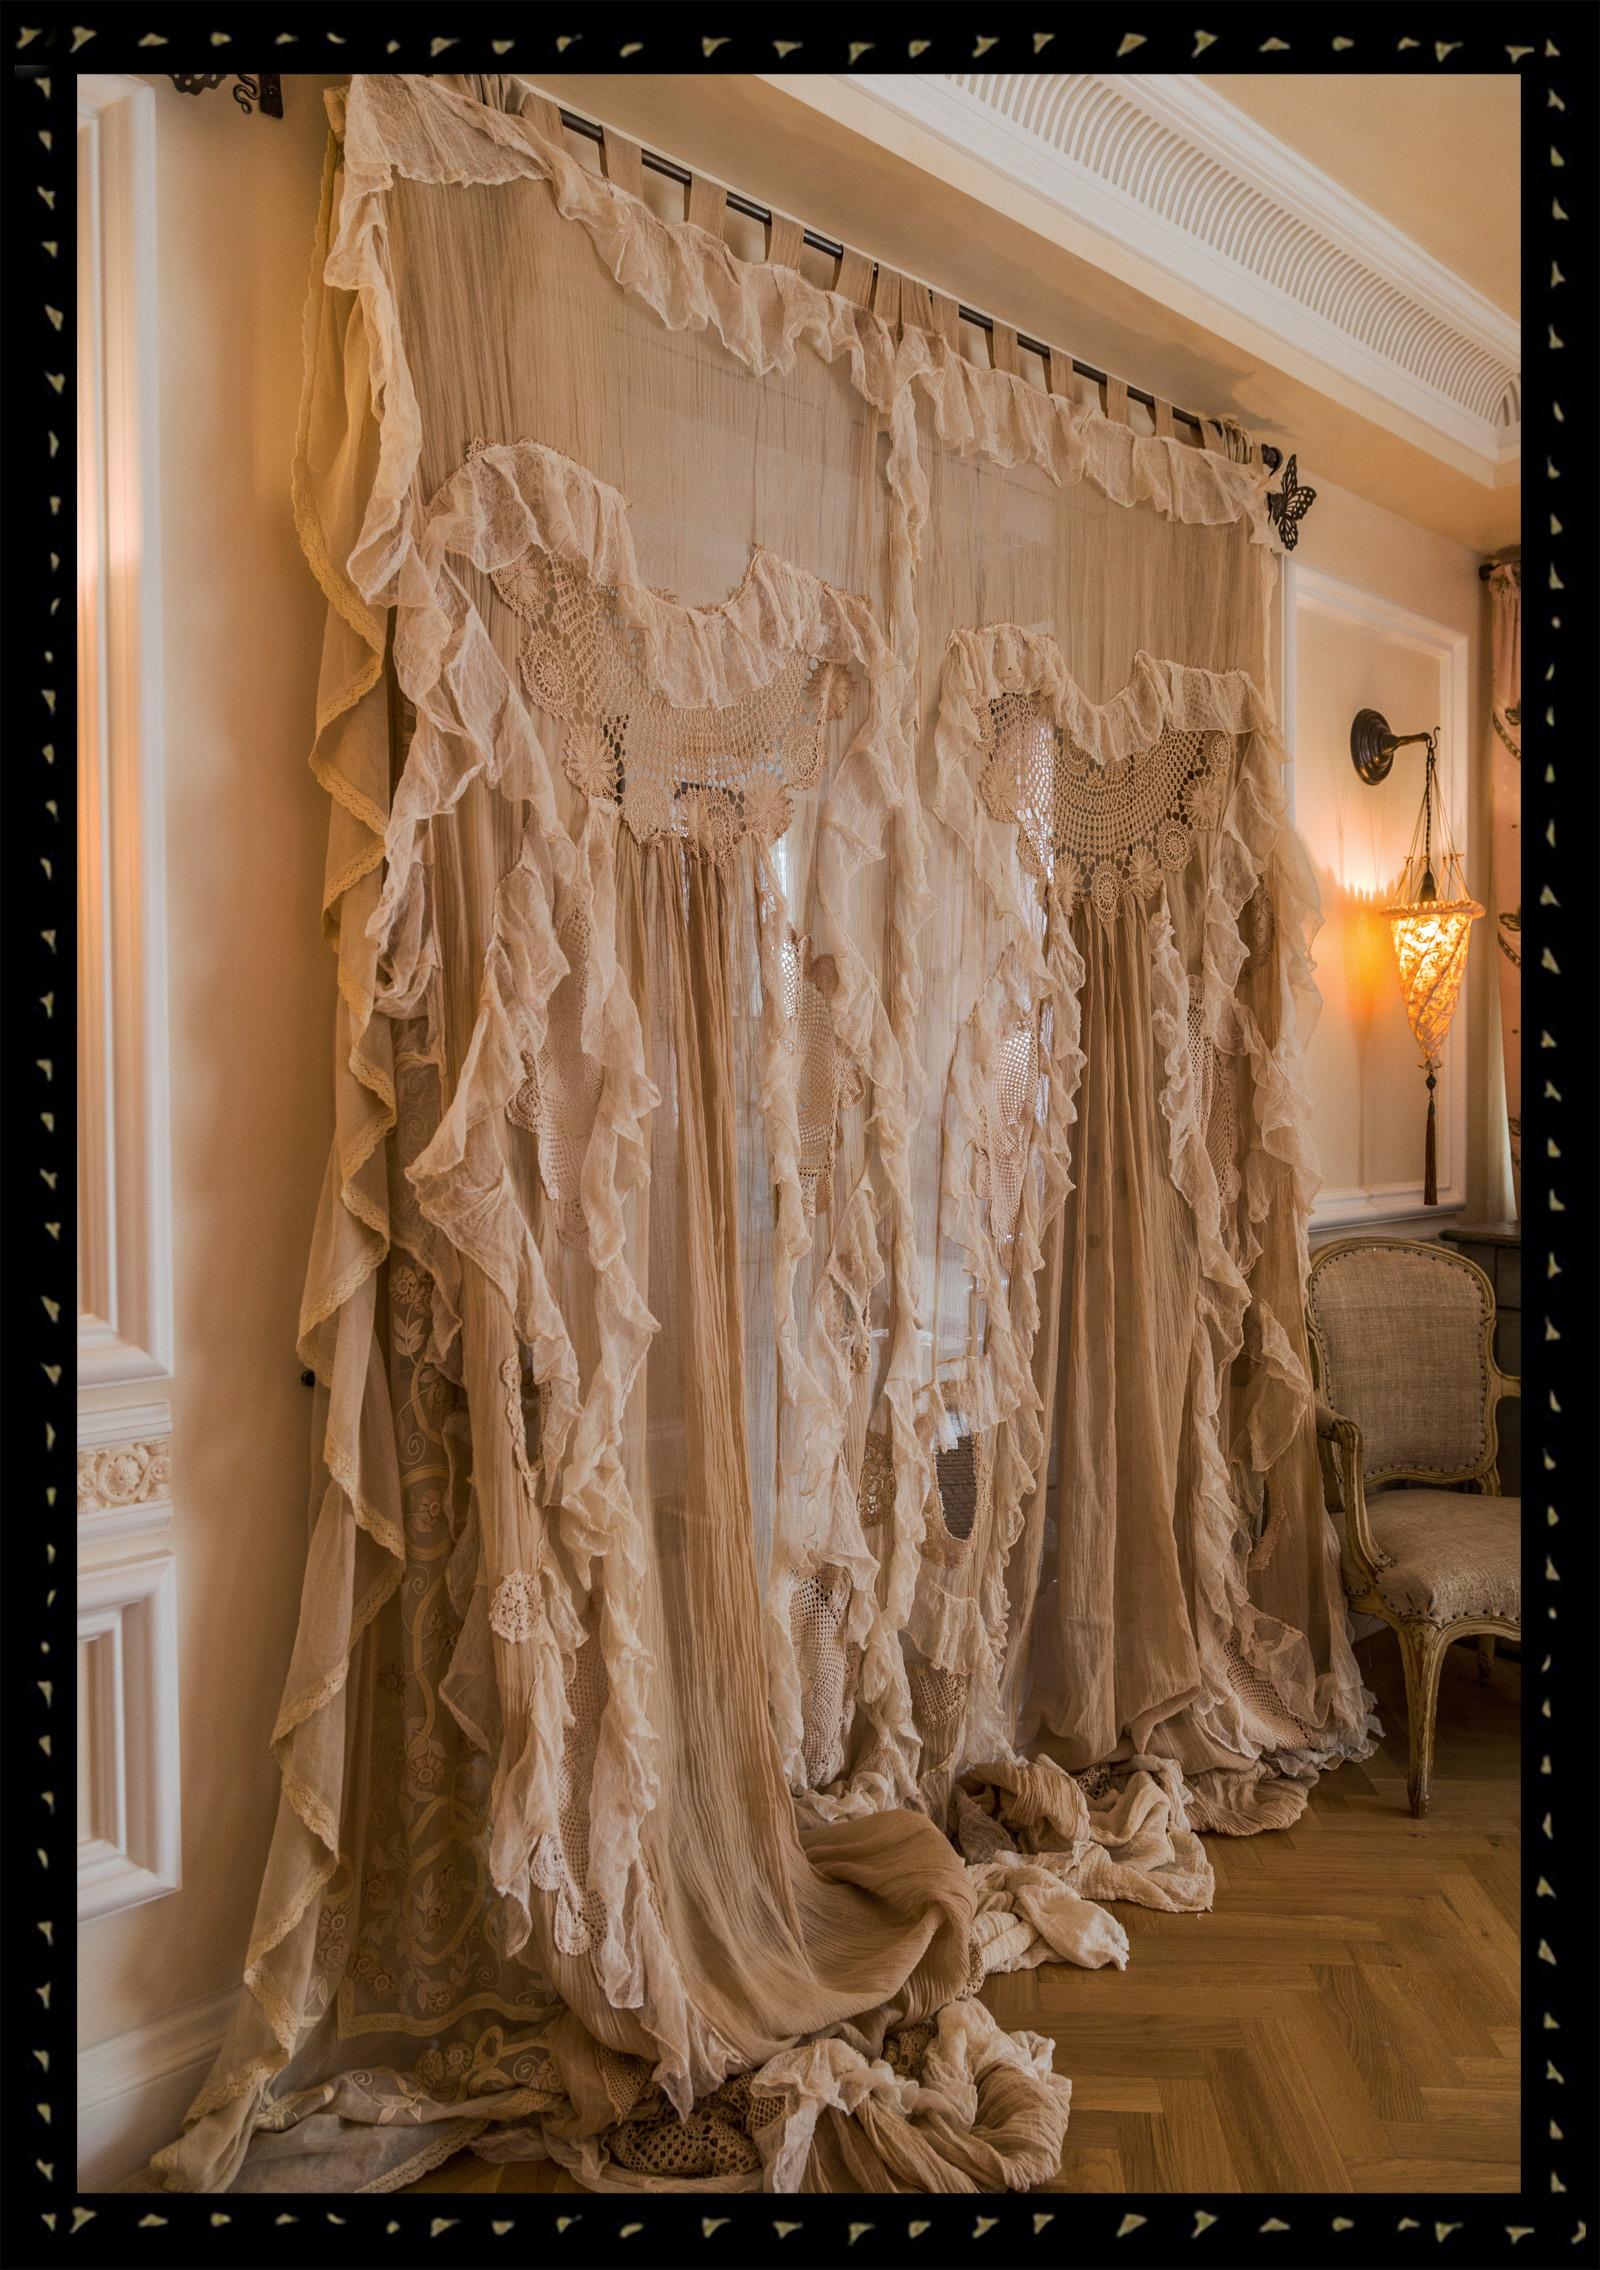 Curtain-40.jpg